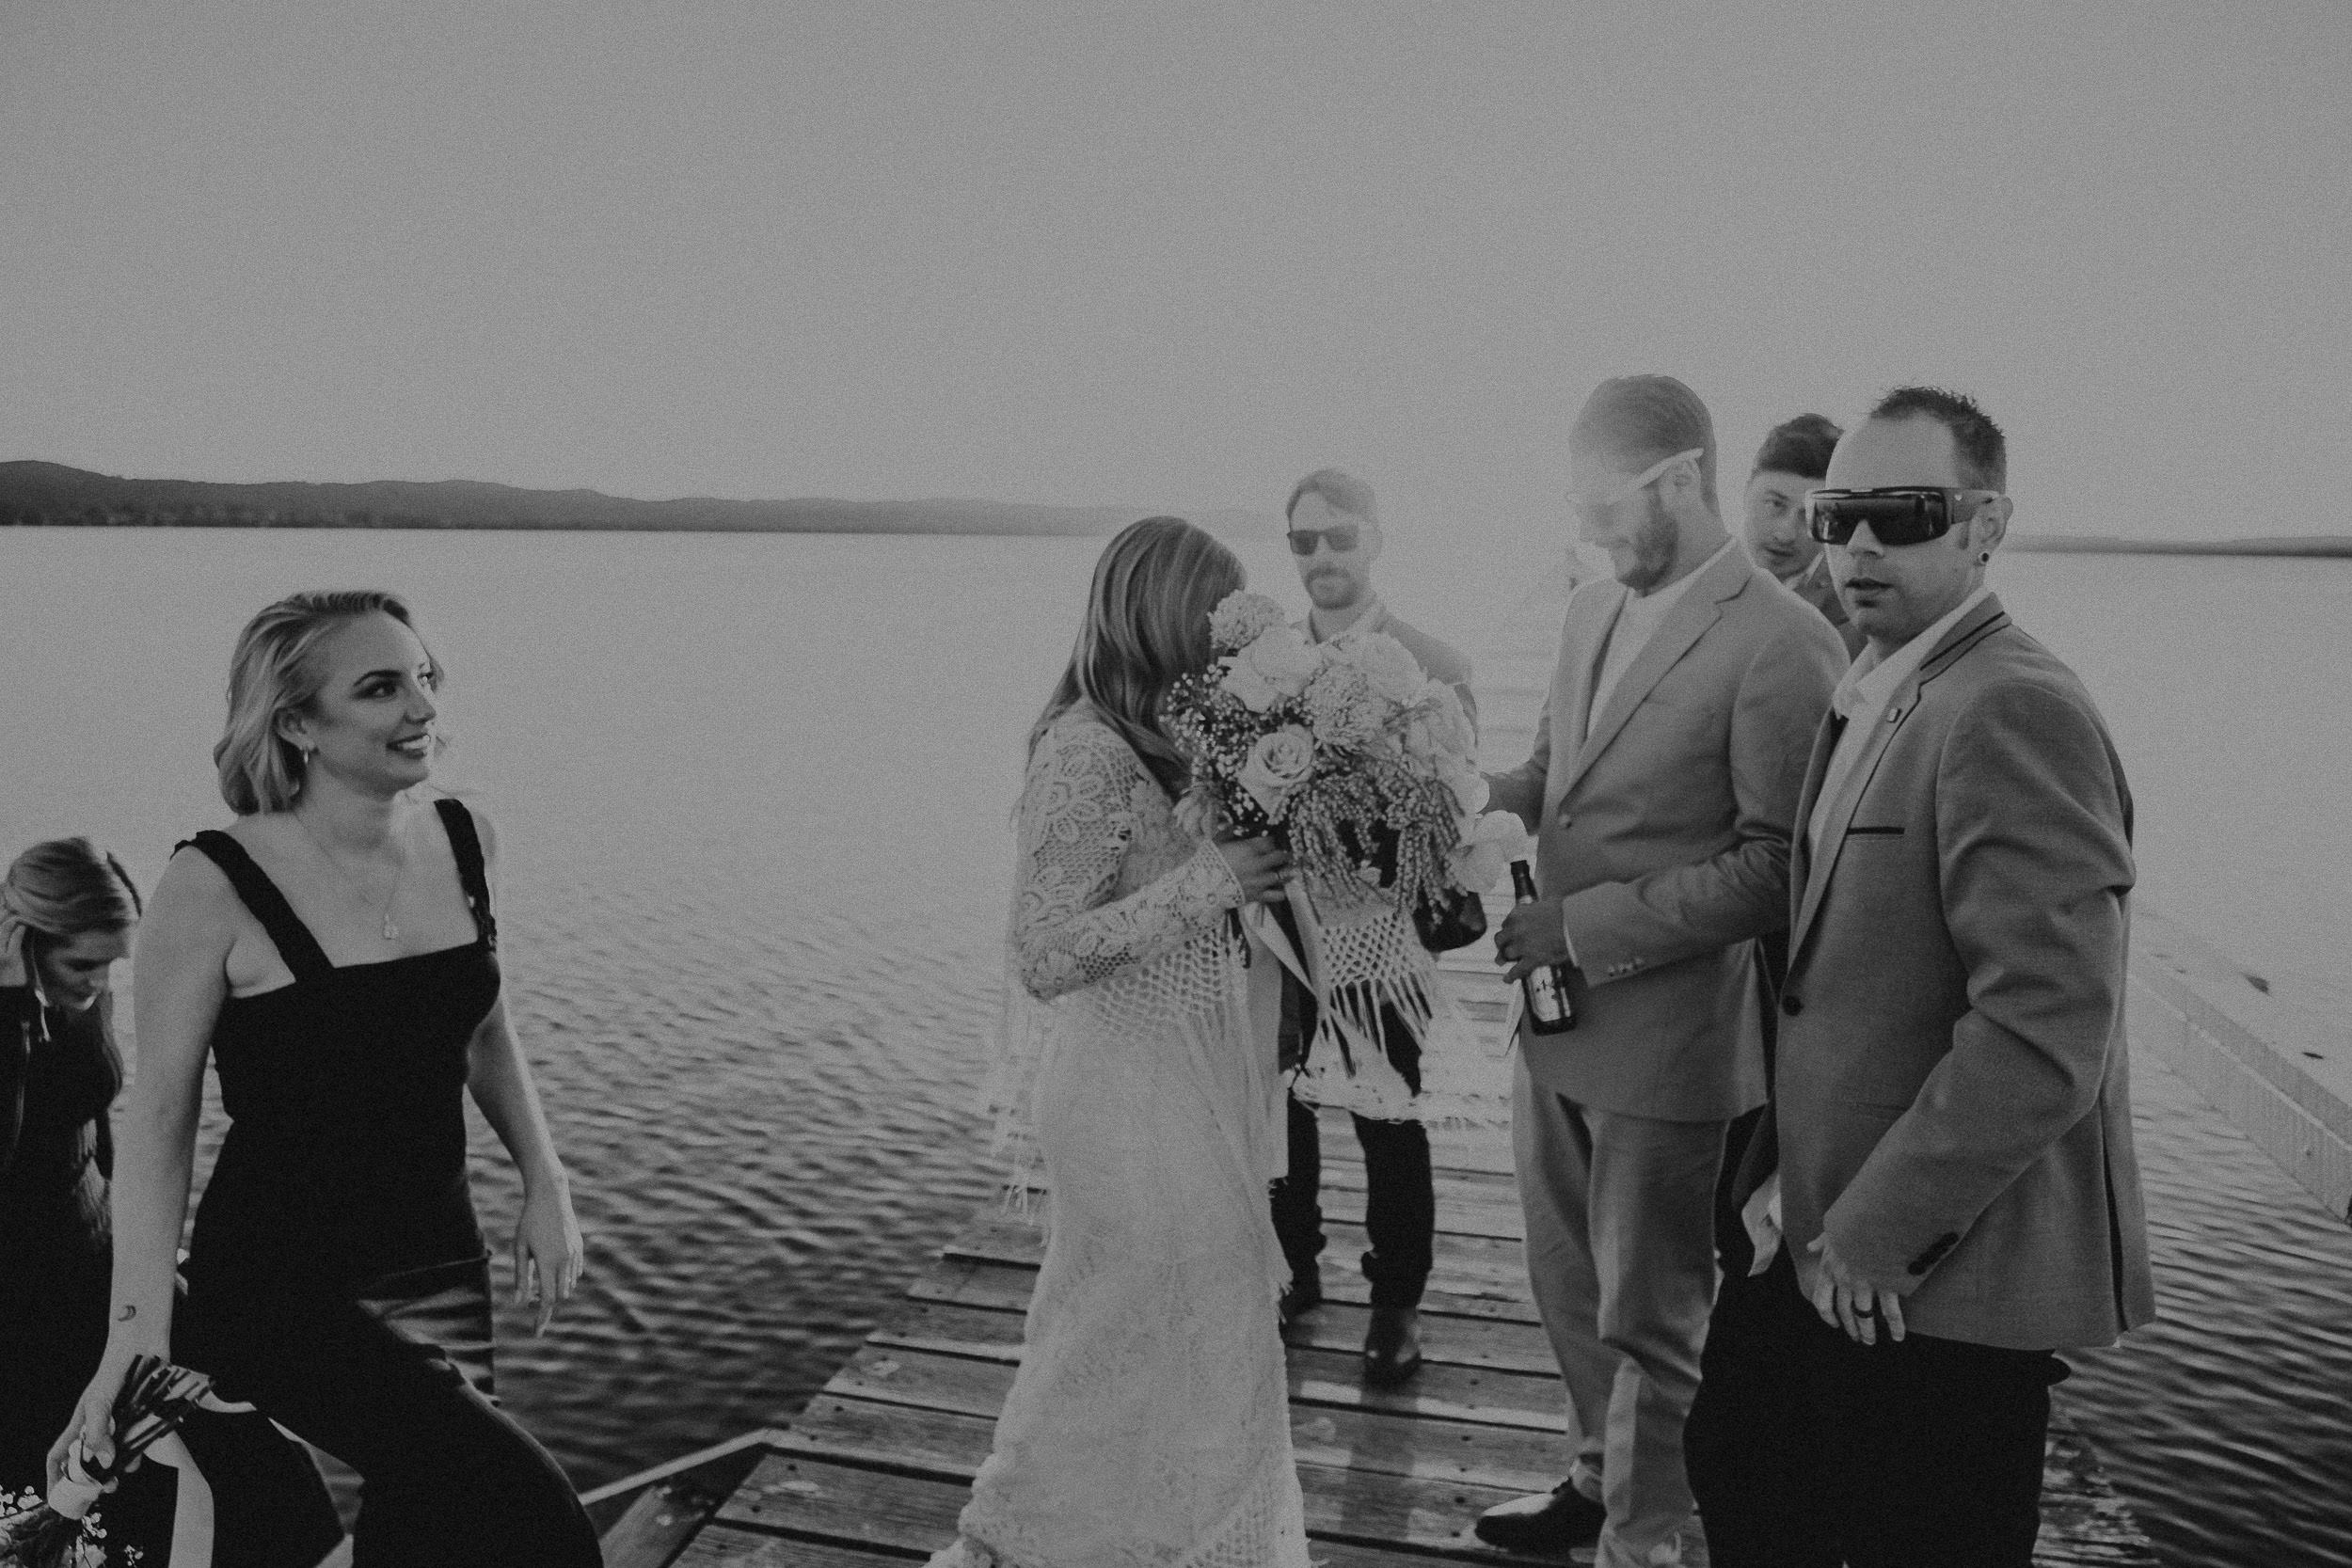 S&A Elopement - Kings & Thieves - Shred 'Til Dead - Central Coast Beach Forest Wedding - 374.jpg